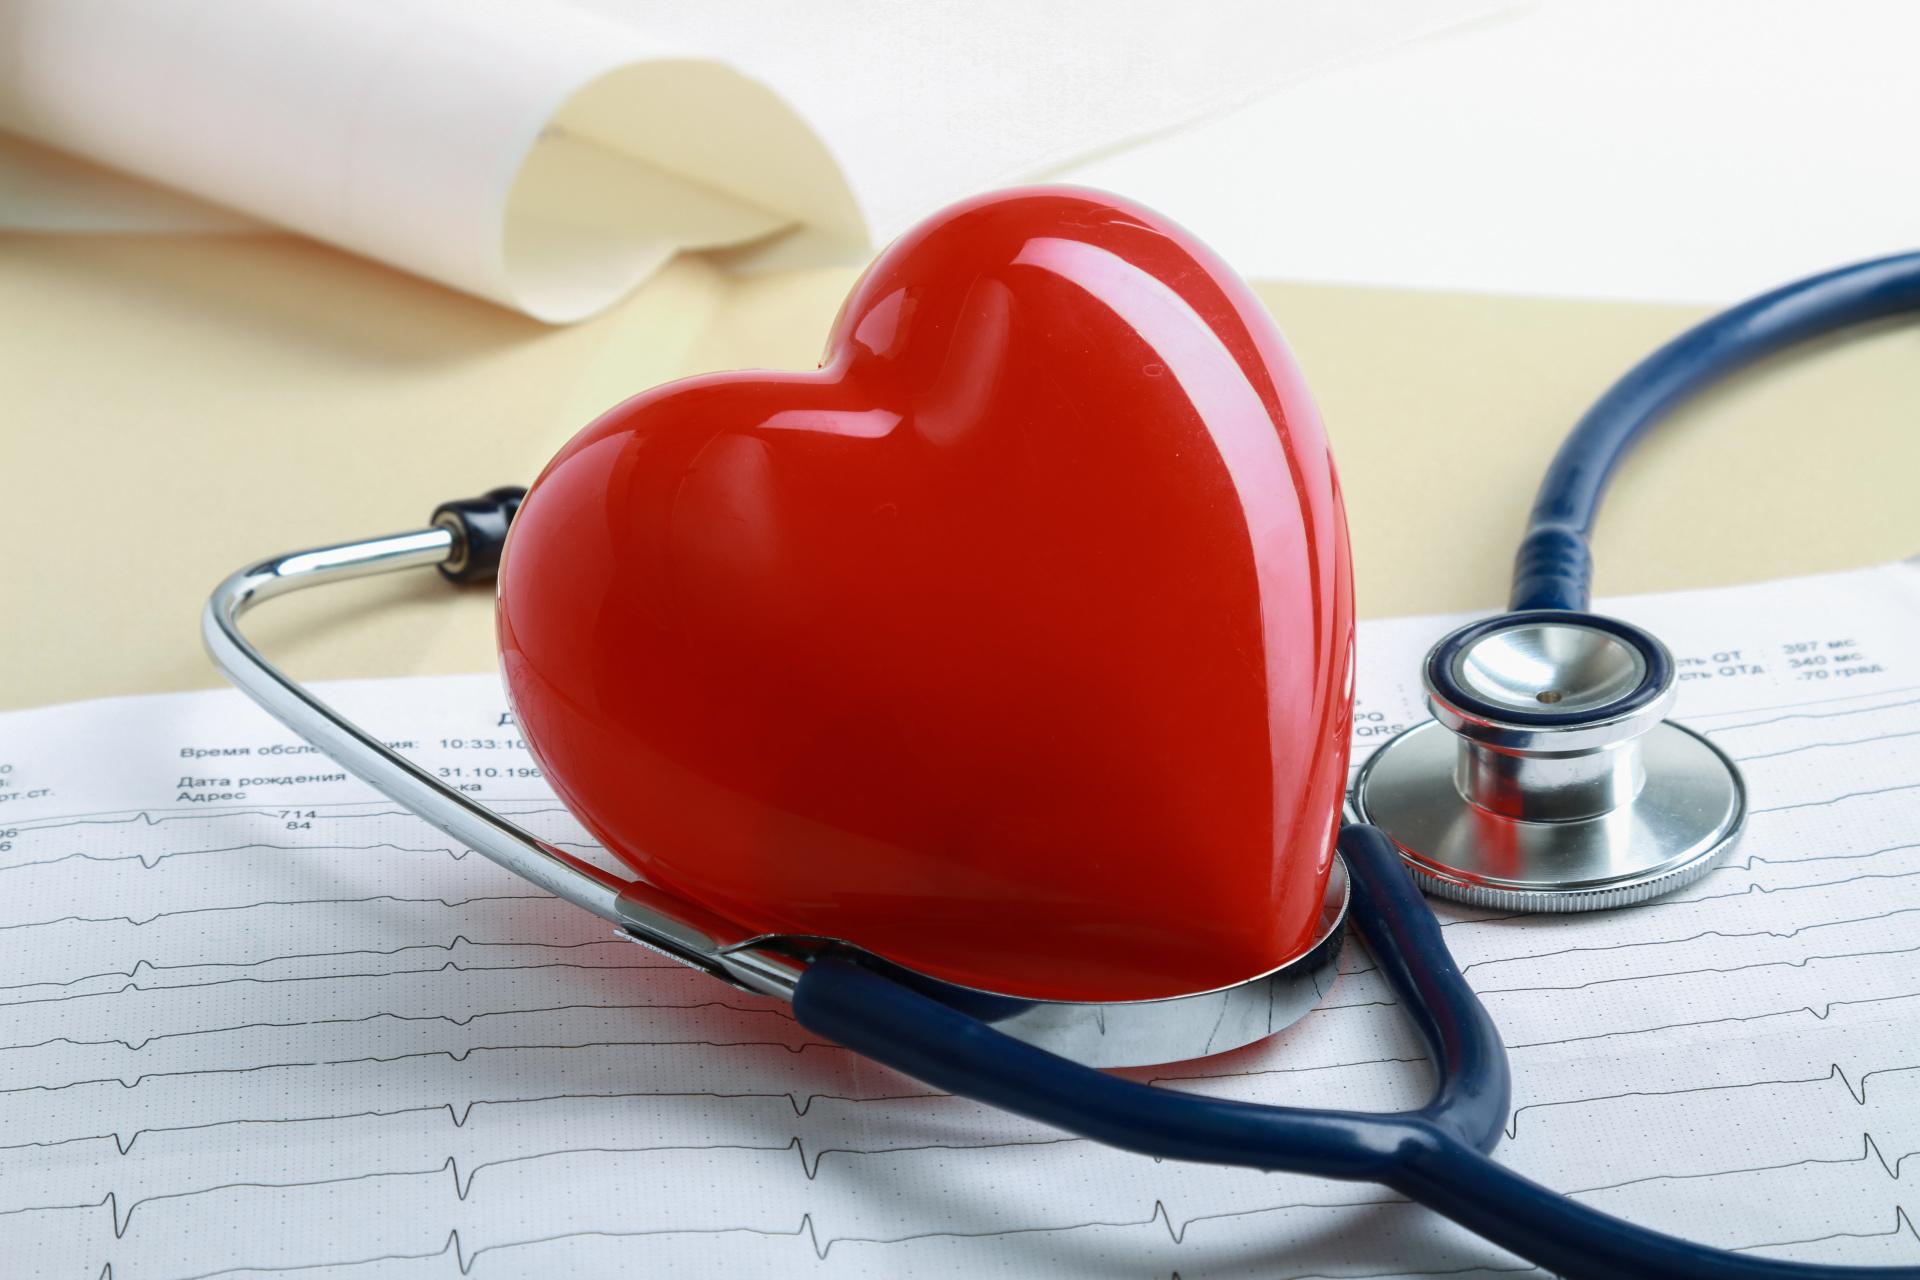 دانلود صدایبوق تپش قلب تپش قلب